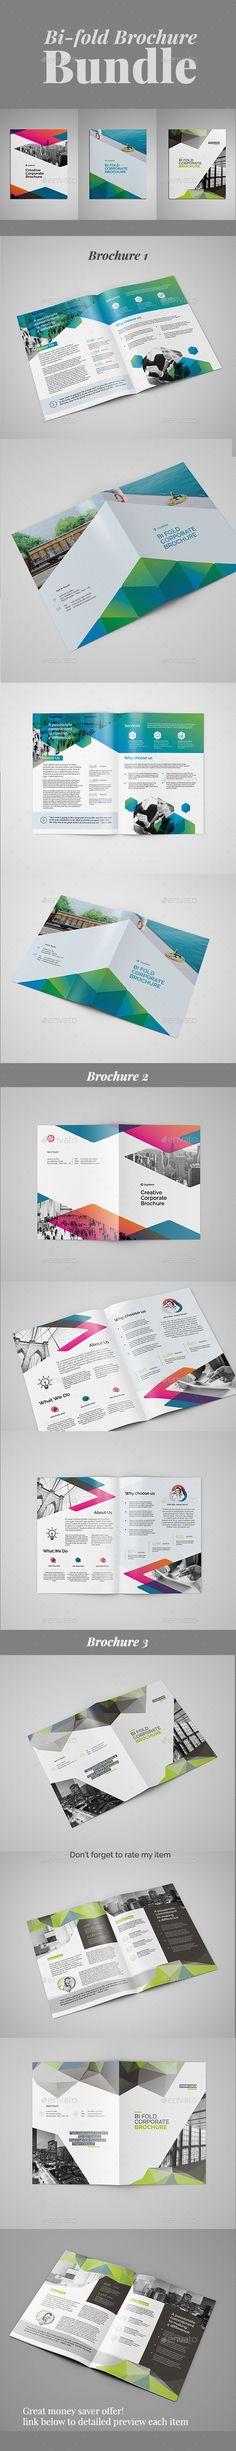 Travel Agency Bifold  Halffold Brochure   Brochures Ai